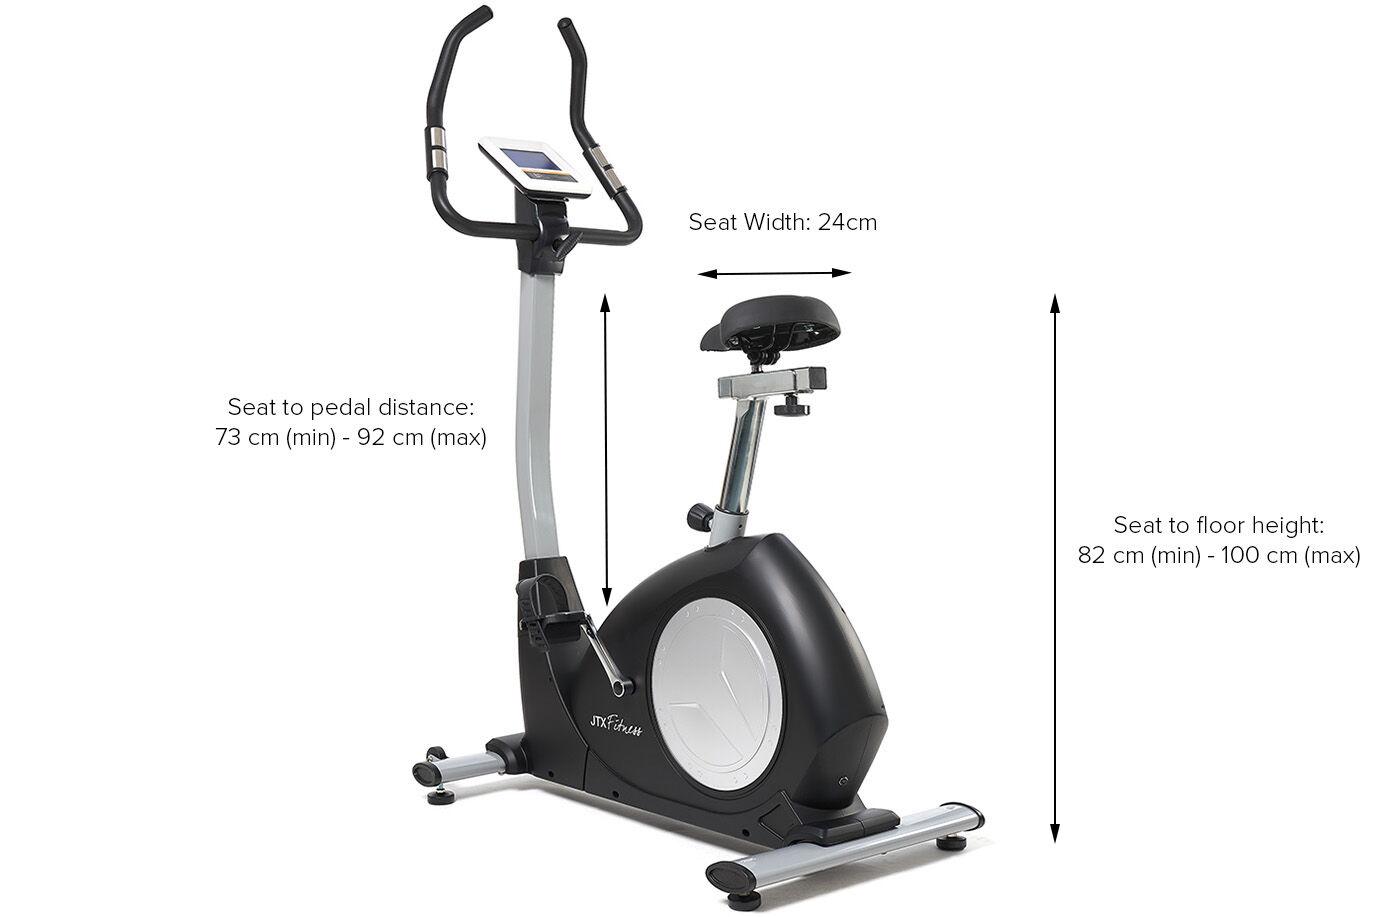 Compact Exercise Bike